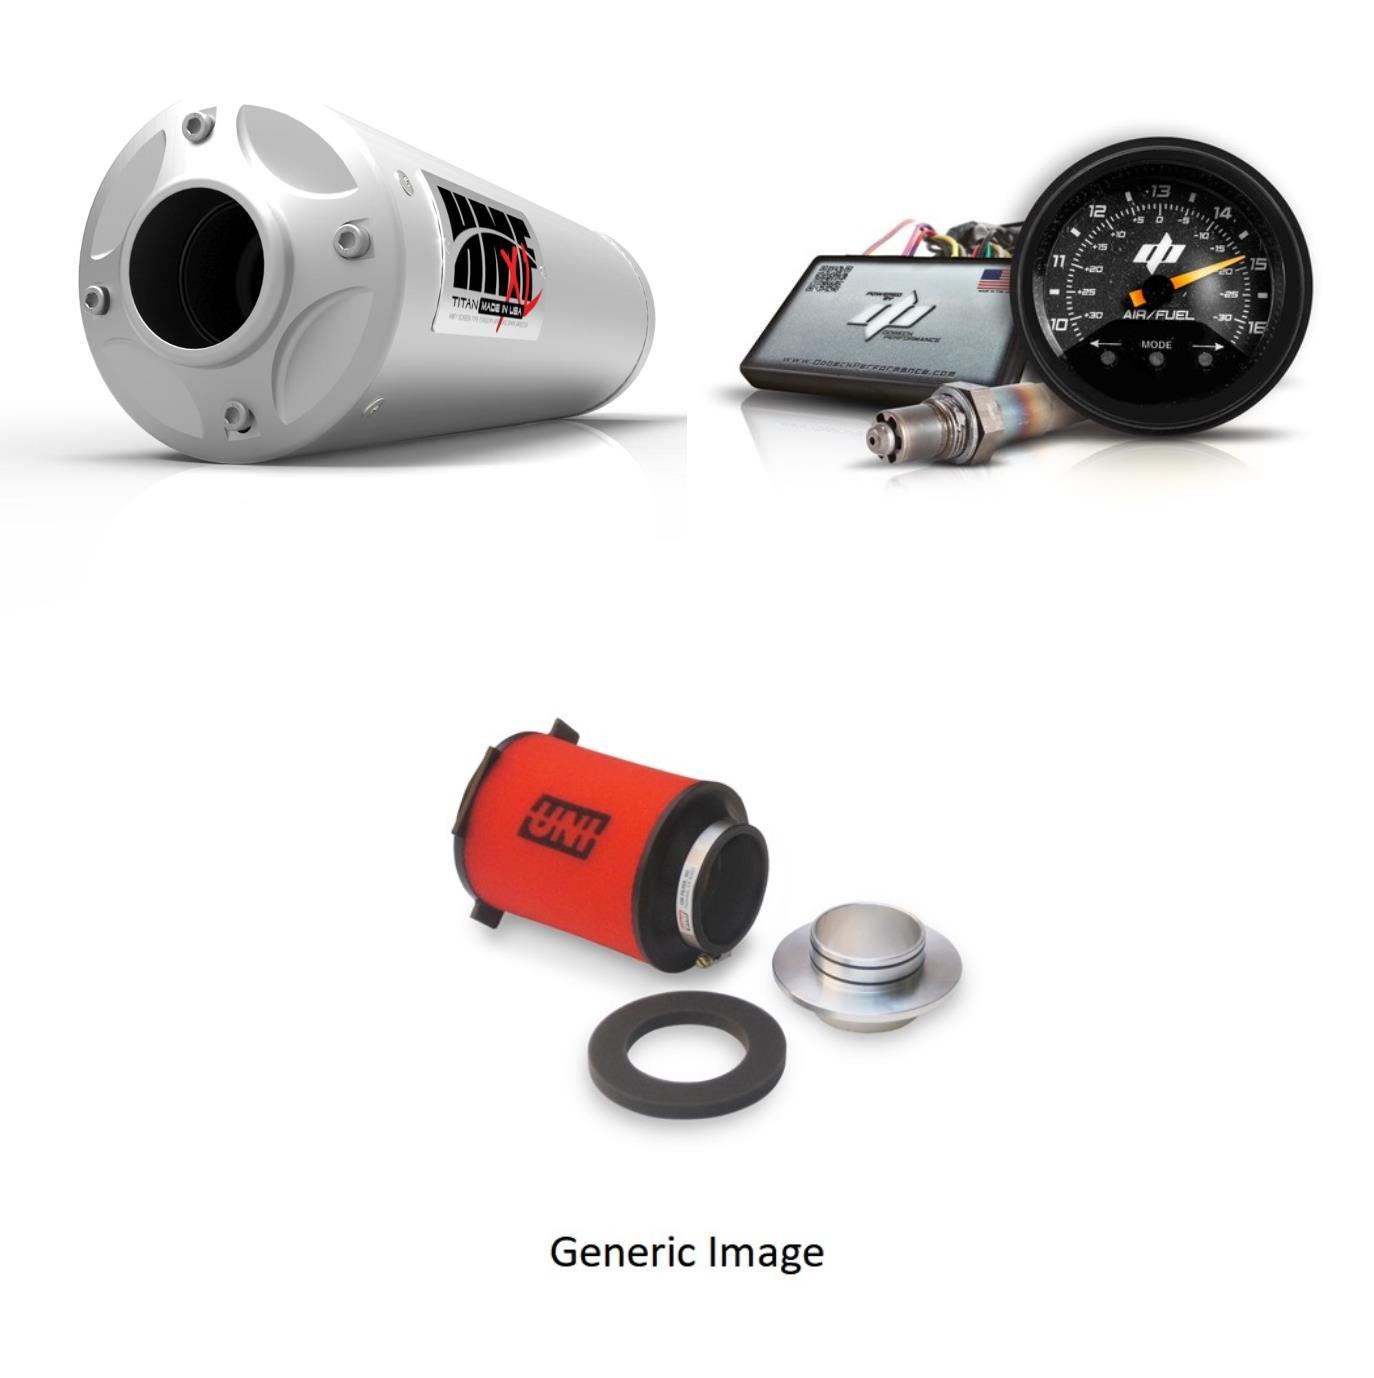 Foam Filter, AFR+ Fuel Controller & Stainless-Steel Titan-XL-Series Slip On Exhaust Billet for Yamaha YXZ 1000R 2016